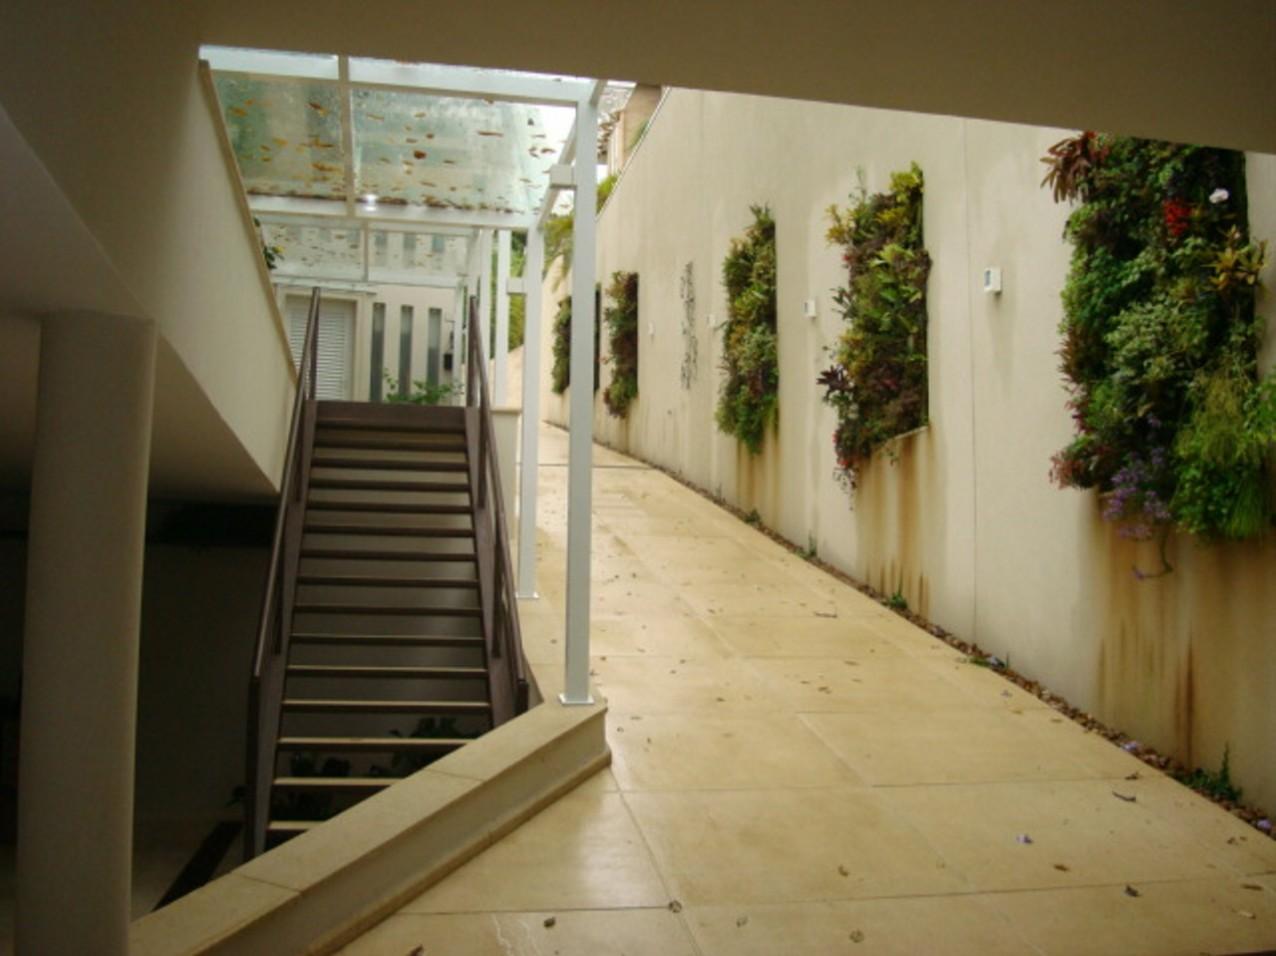 Obra residencial Alphaville - Corredor interno